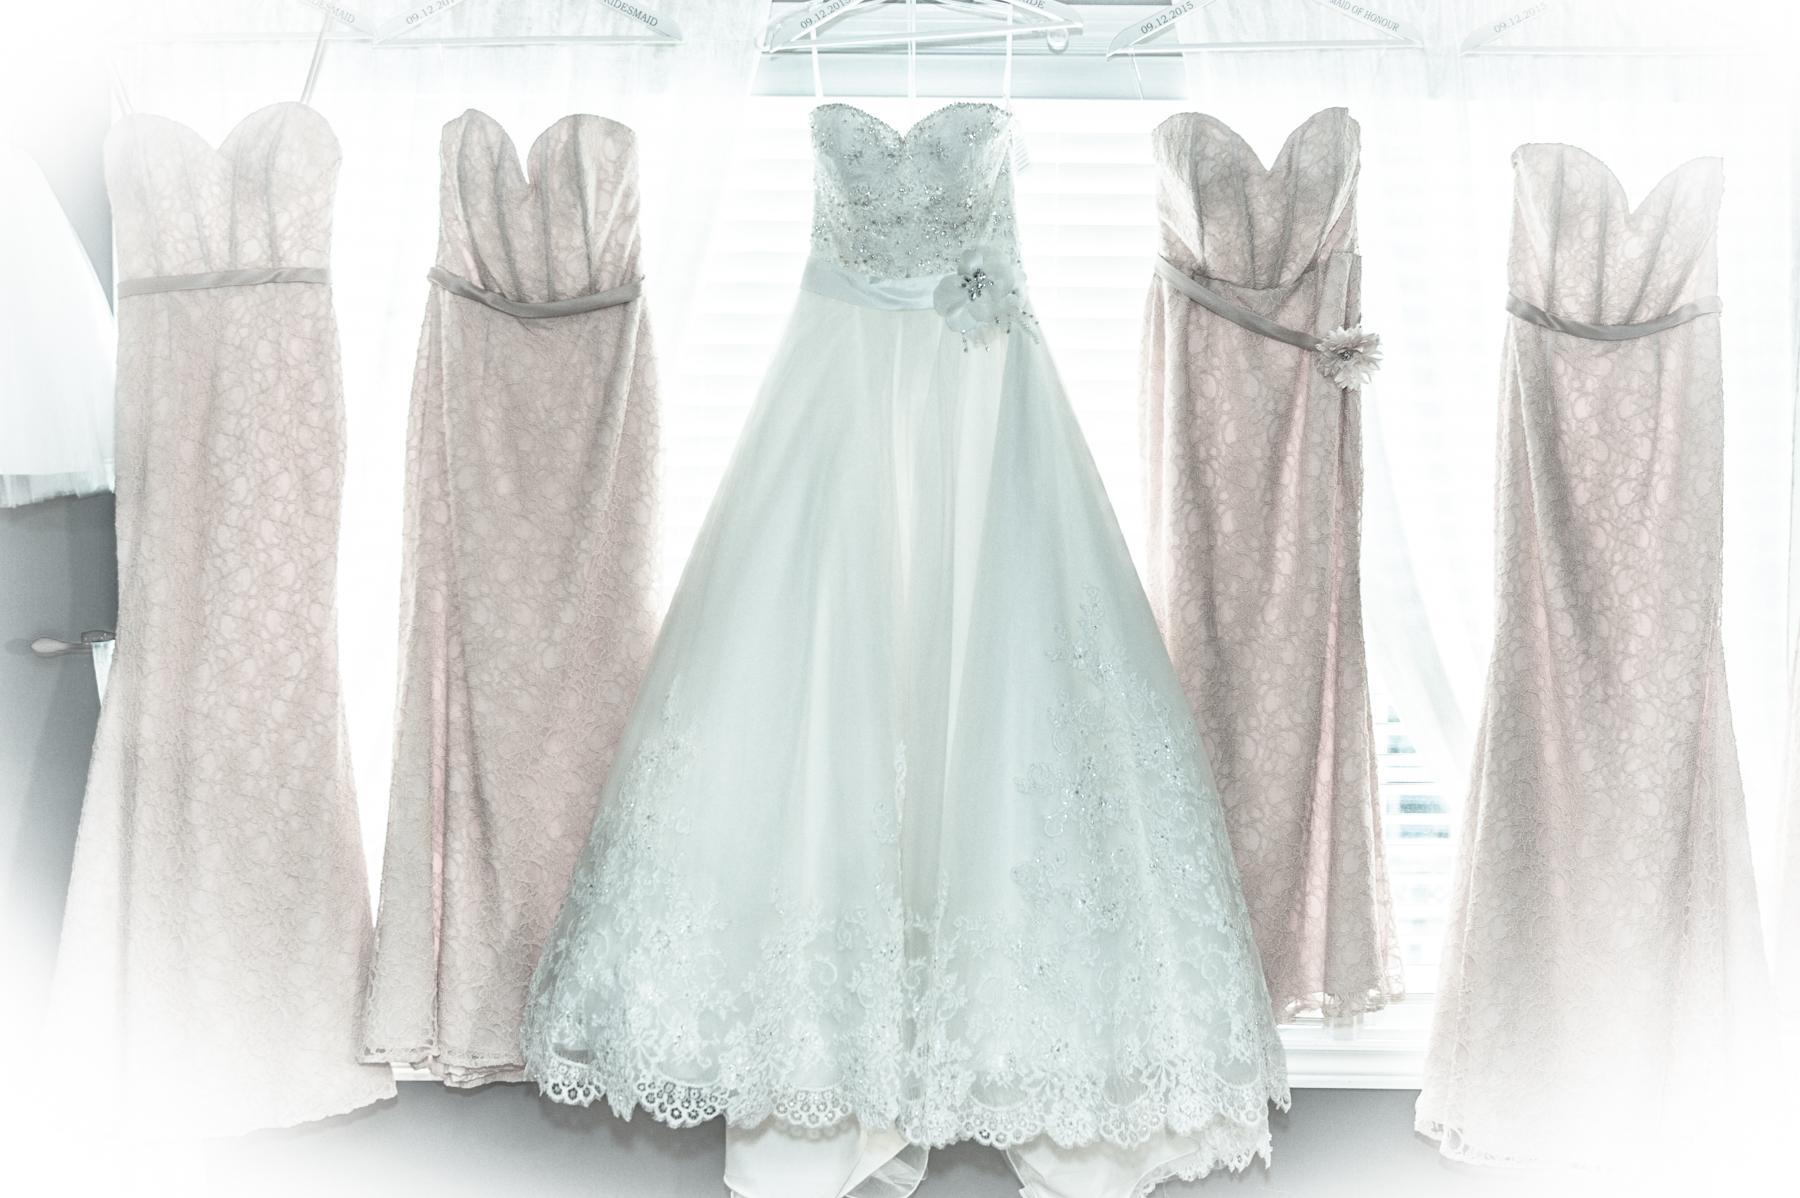 Bride dress and bridesmaid dressing